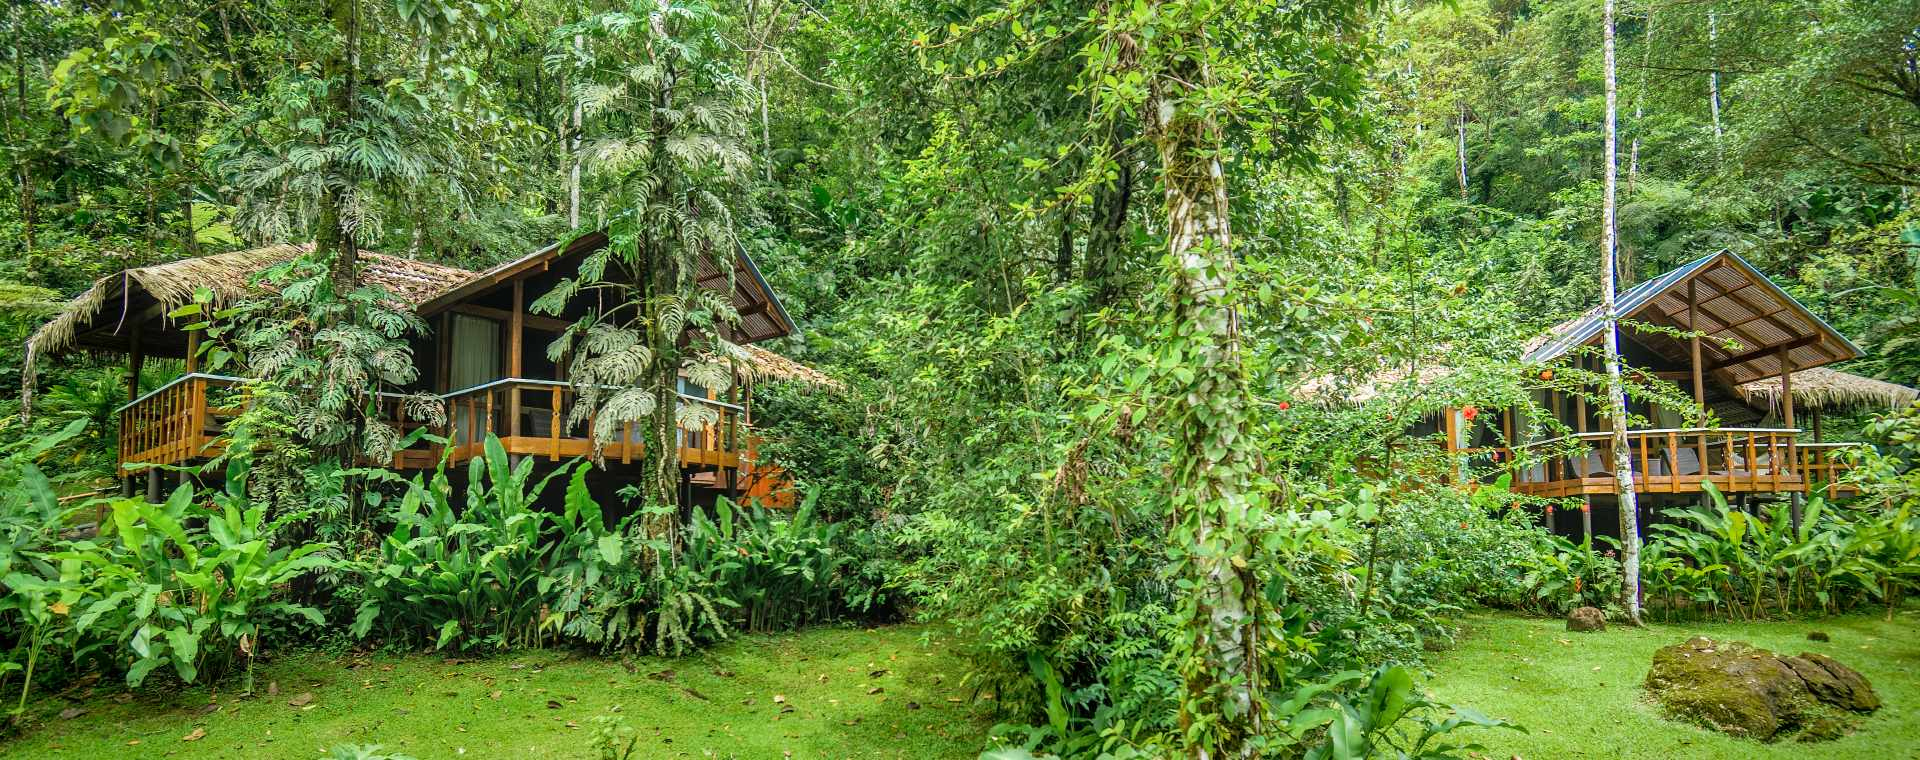 Pacuare Lodge, Costa Rica   Plan South America